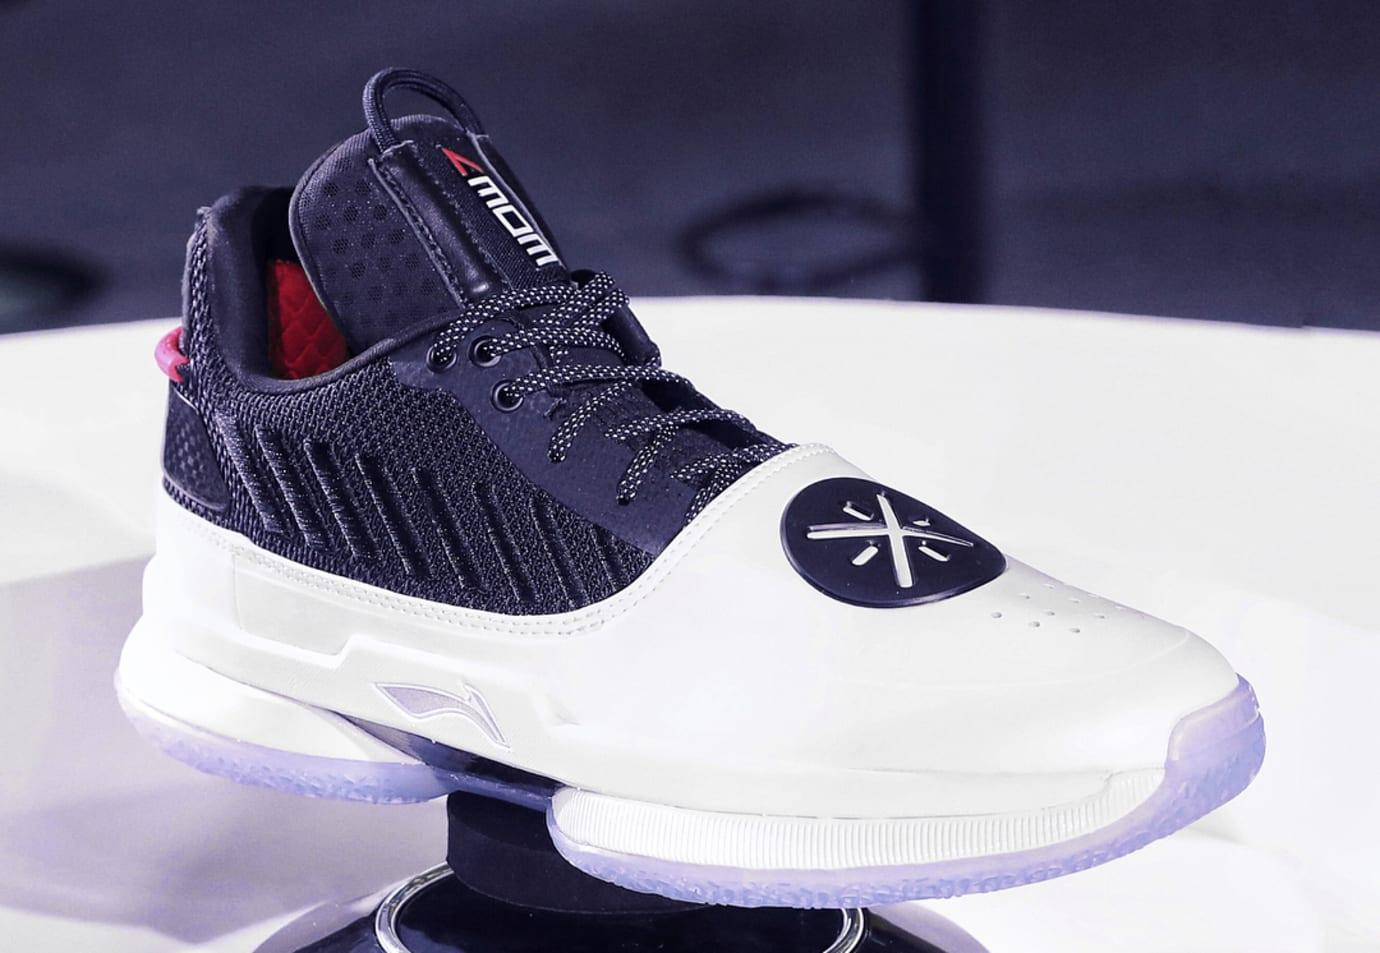 ba2d31aa20ad Li-Ning Way of Wade 7 Dwyane Wade Signature Sneaker Release Date ...